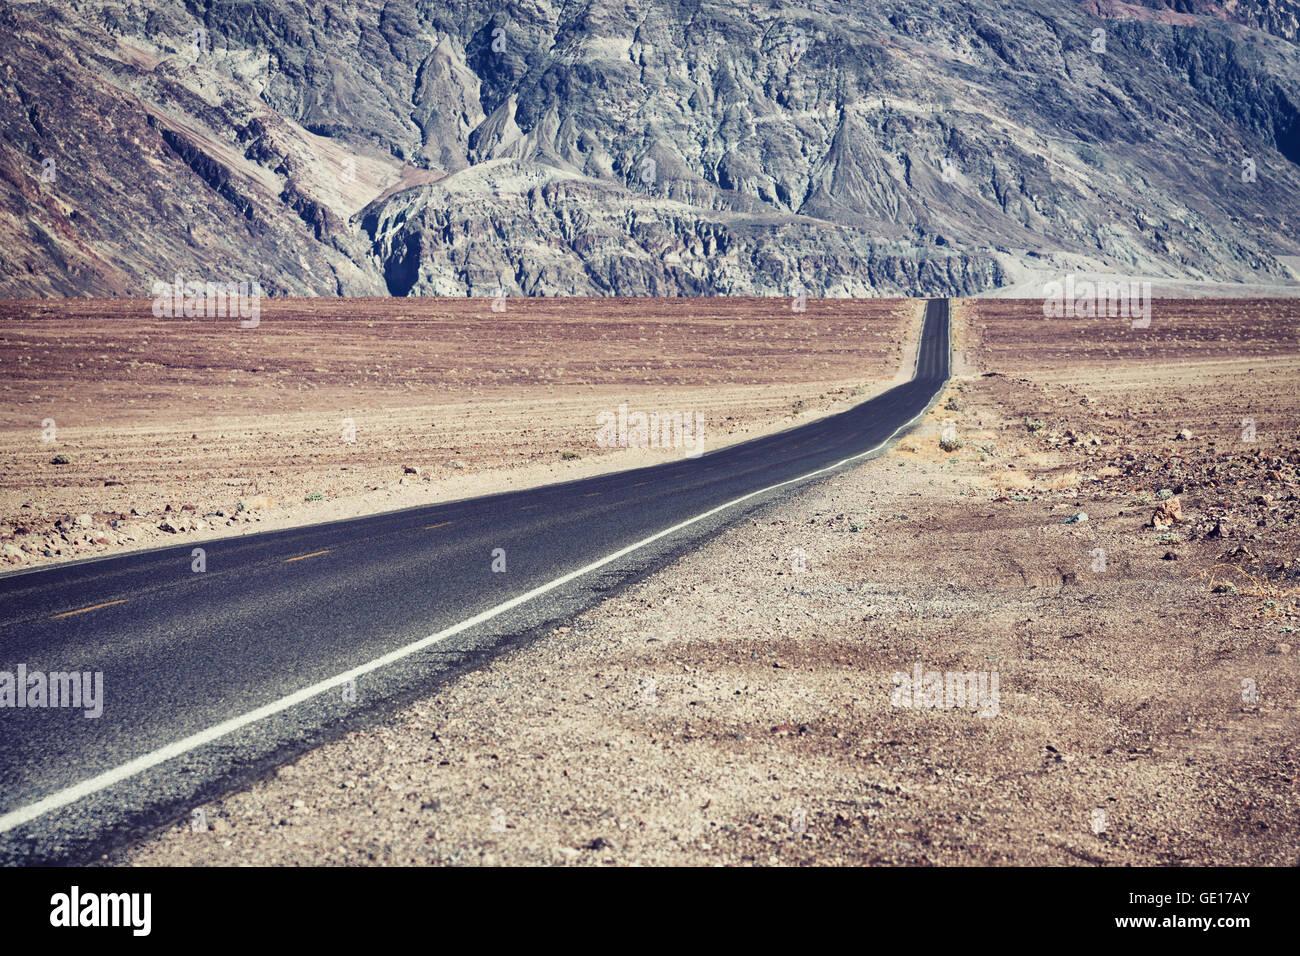 road in Arizona desert, USA - Stock Image